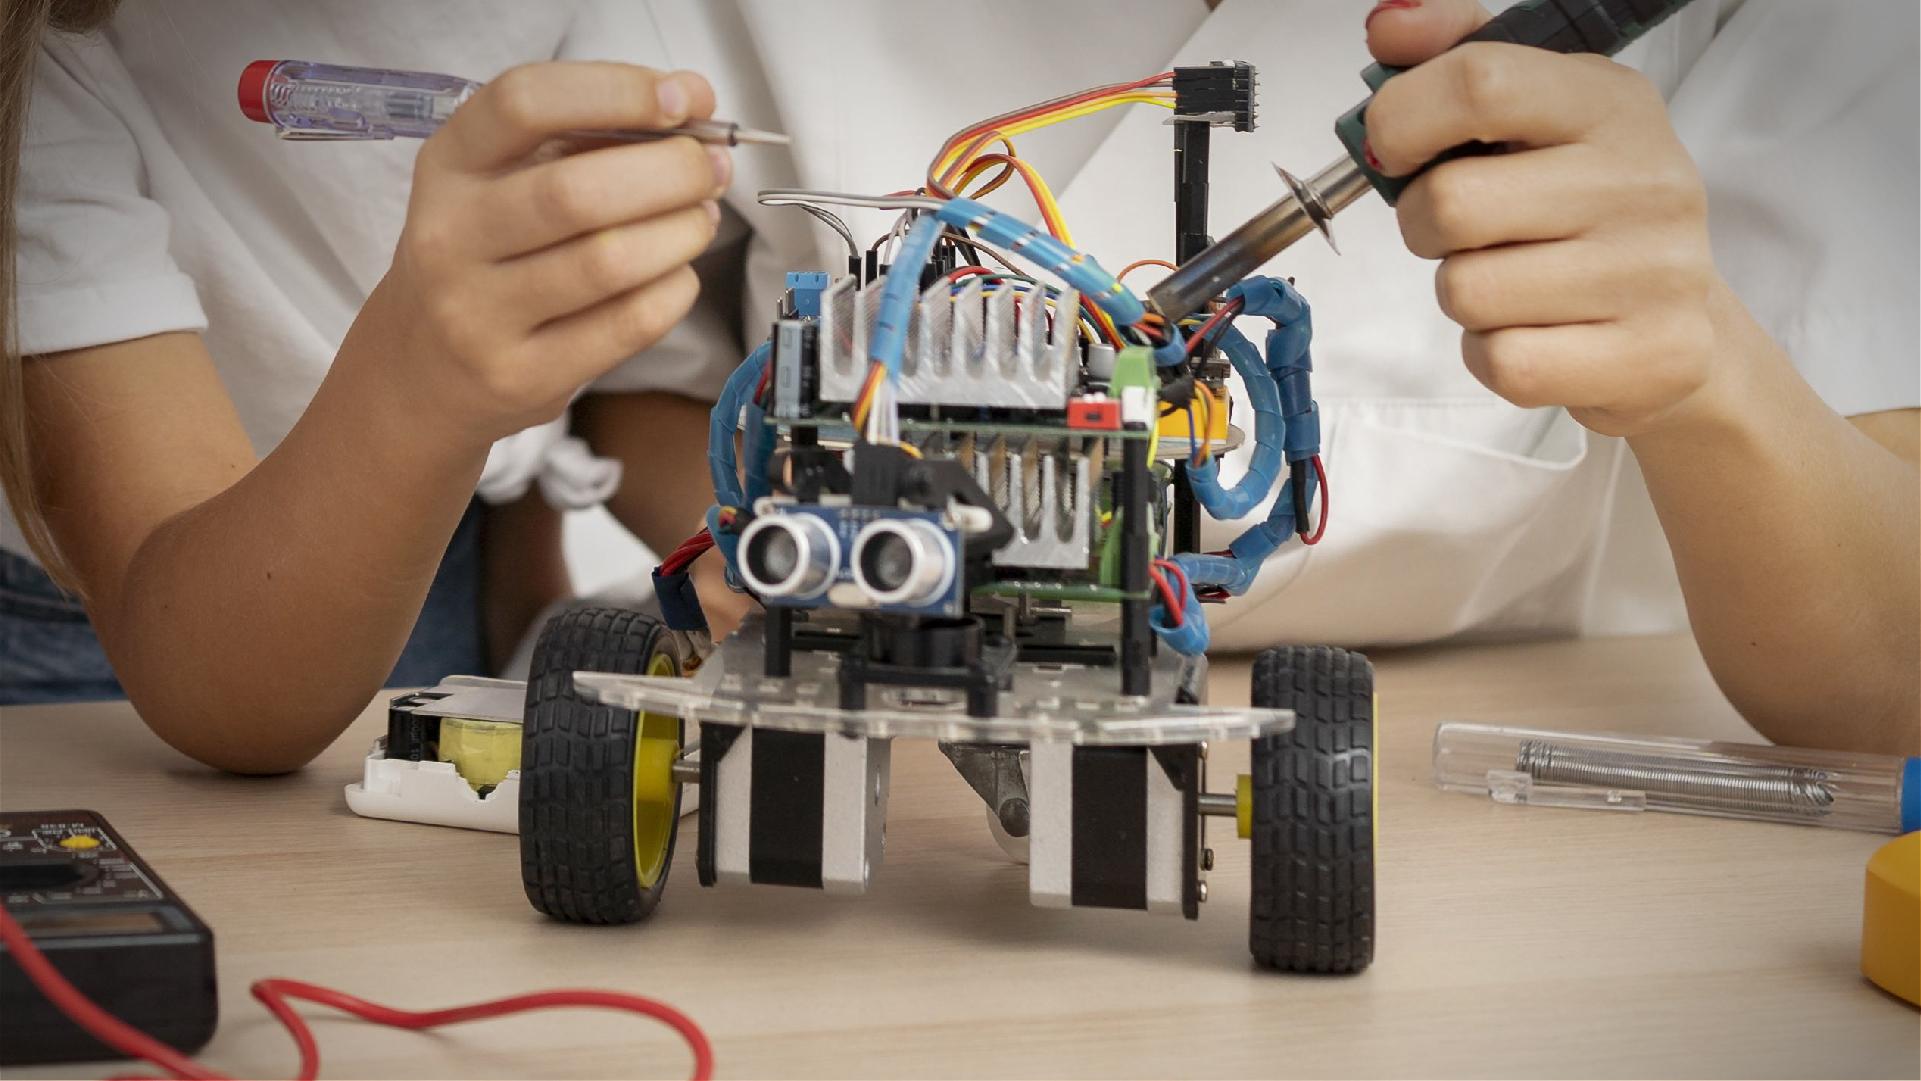 La robótica educativa hacia la mentefactura